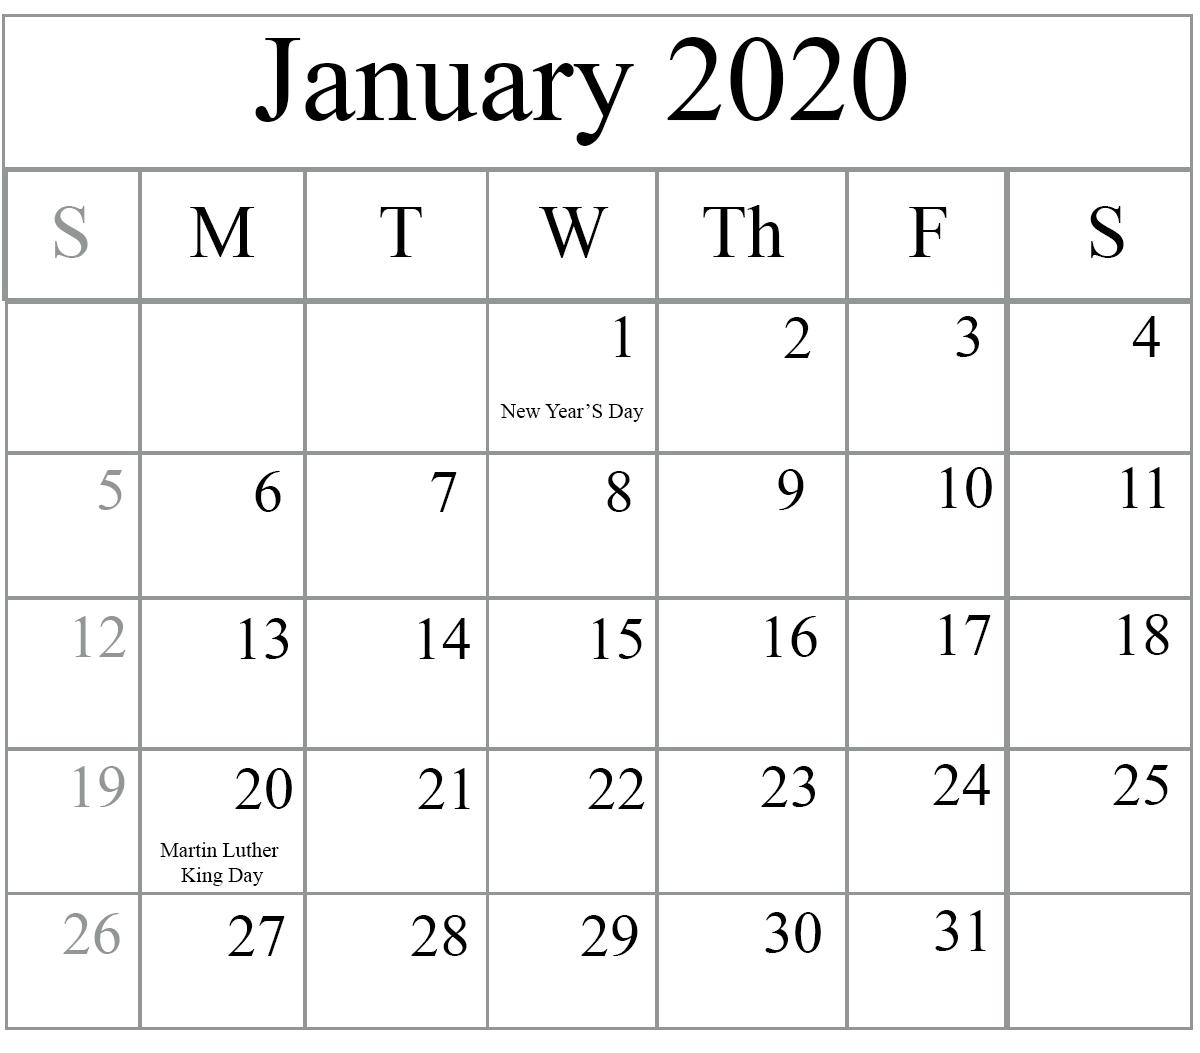 Free January 2020 Printable Calendar In Pdf, Excel & Word-Fill In Calendar Template 2020